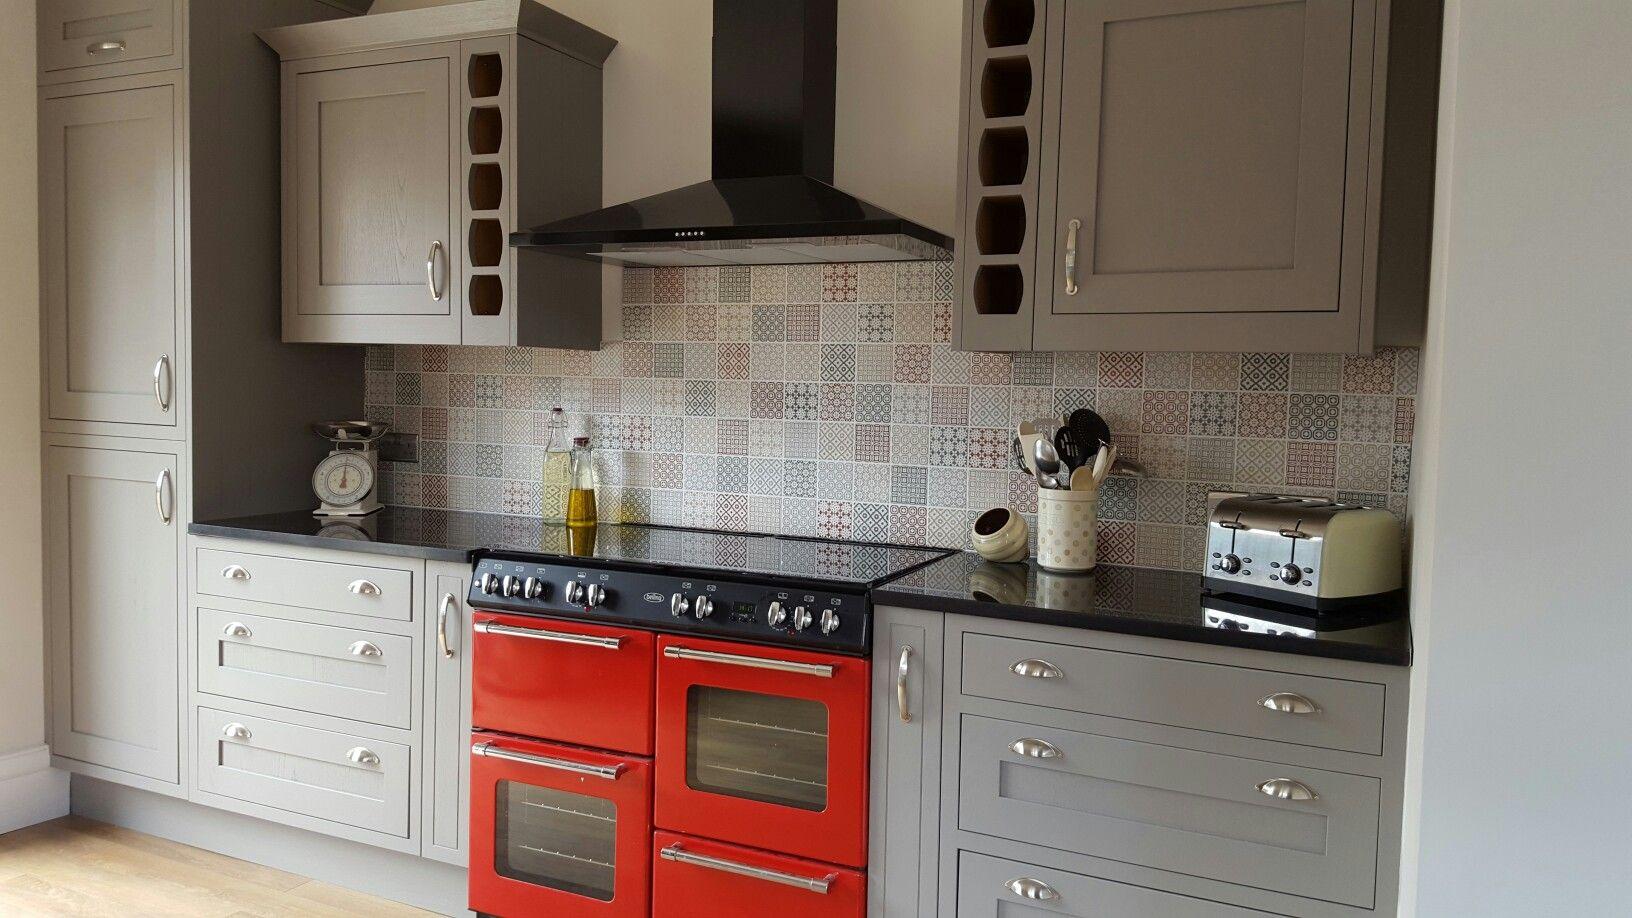 Our Kitchen Is Finished B Q Carisbrooke Taupe Framed Units Granite Tops From Jerusalem Stone And The Tiles Are Dekorasyon Fikirleri Mutfak Mutfak Dekorasyonu